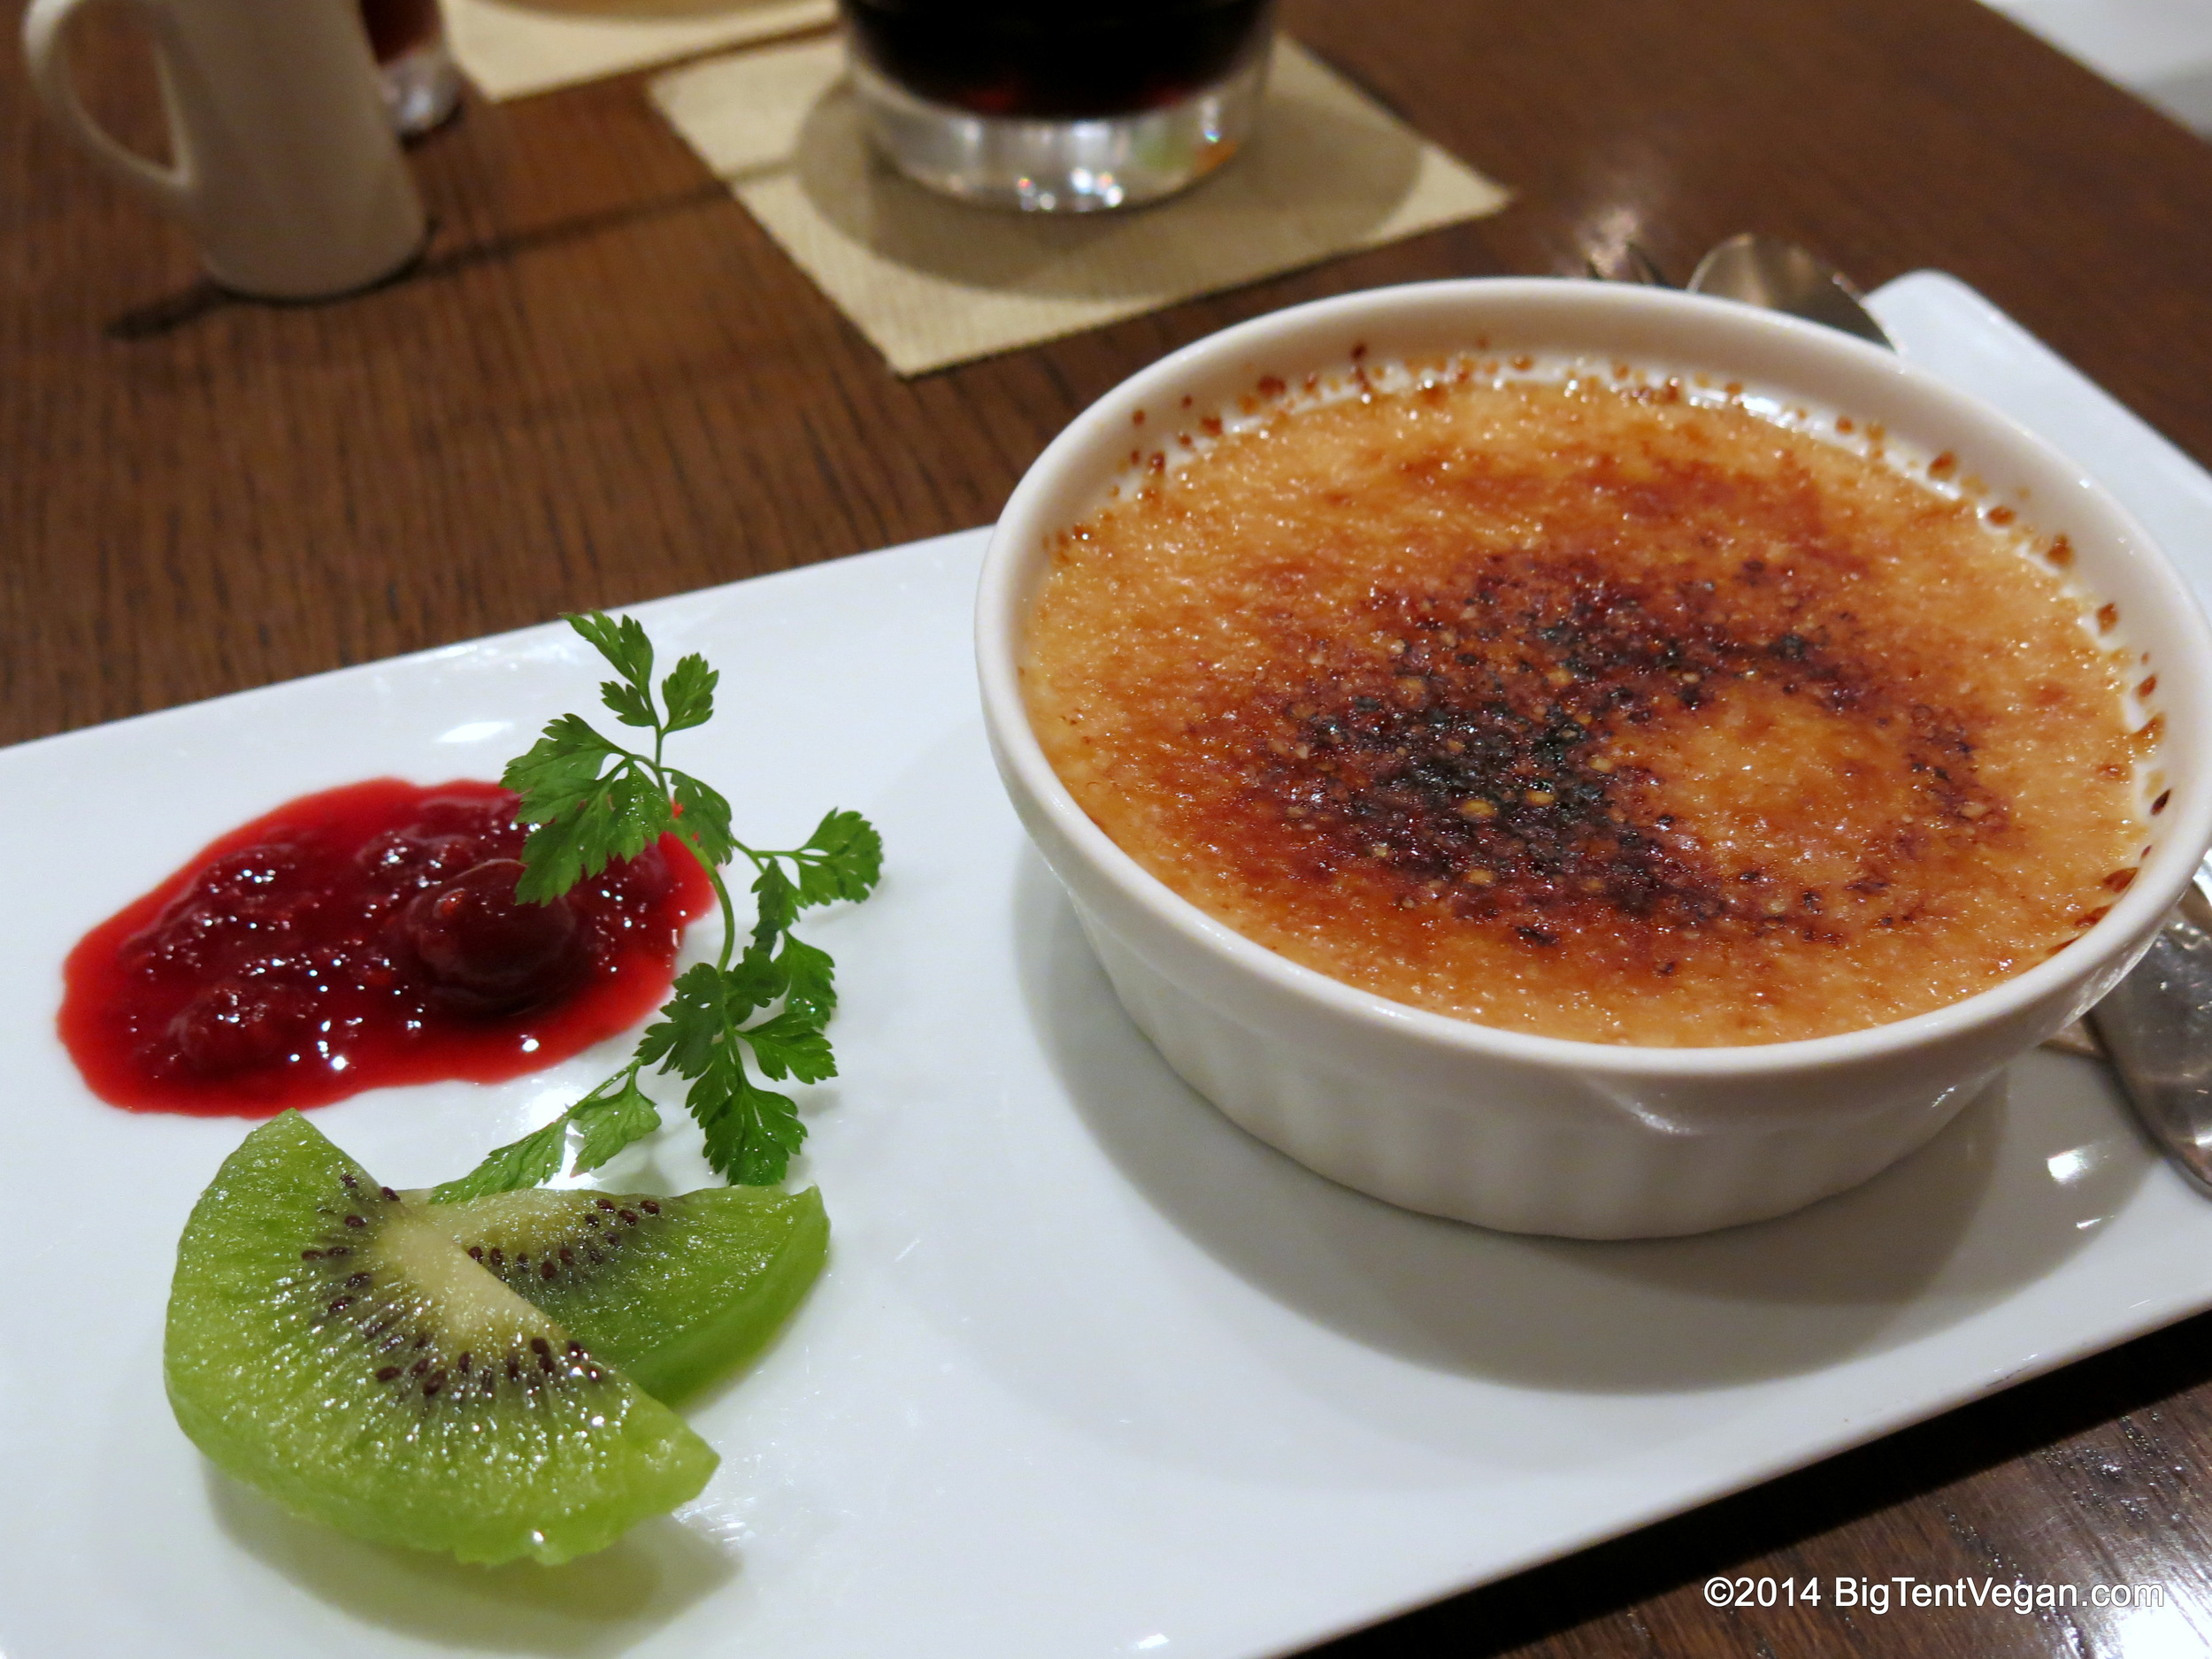 Crème brûlée...light, airy custardy filling with a thin CRISPY topping. Vegan perfection!